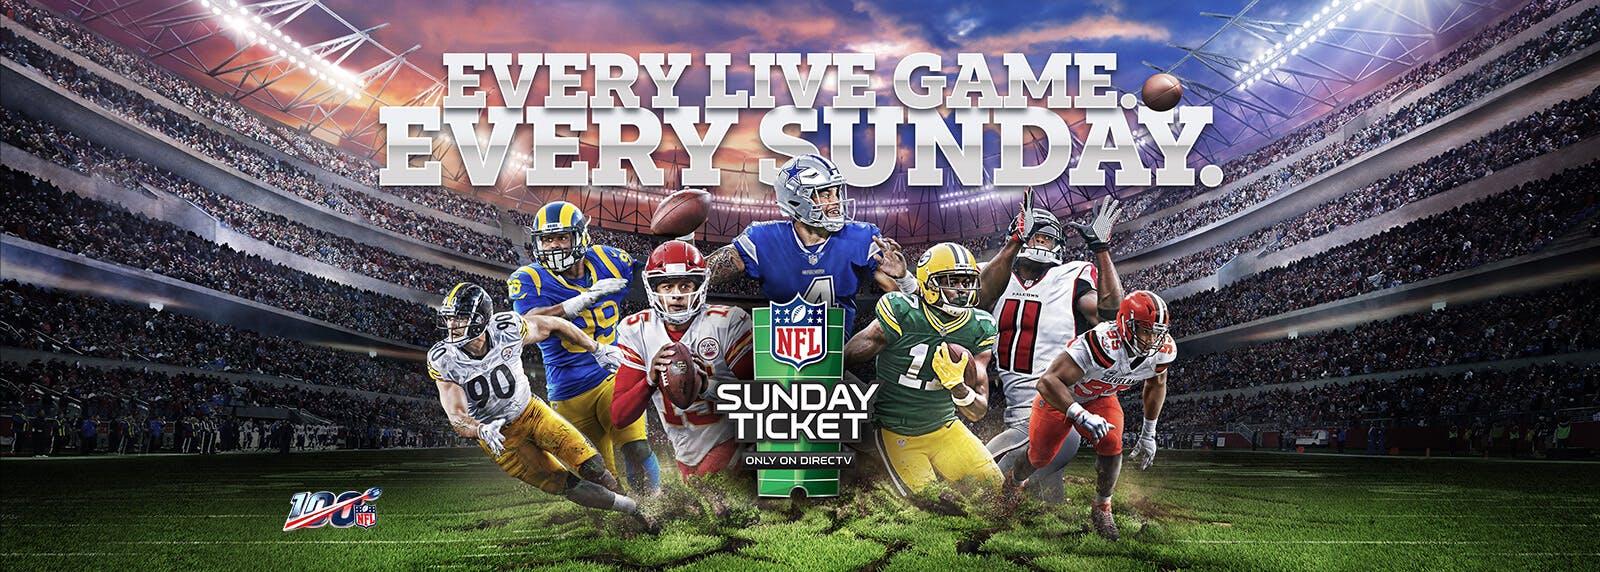 cowboys pats NFL Sunday Ticket streaming